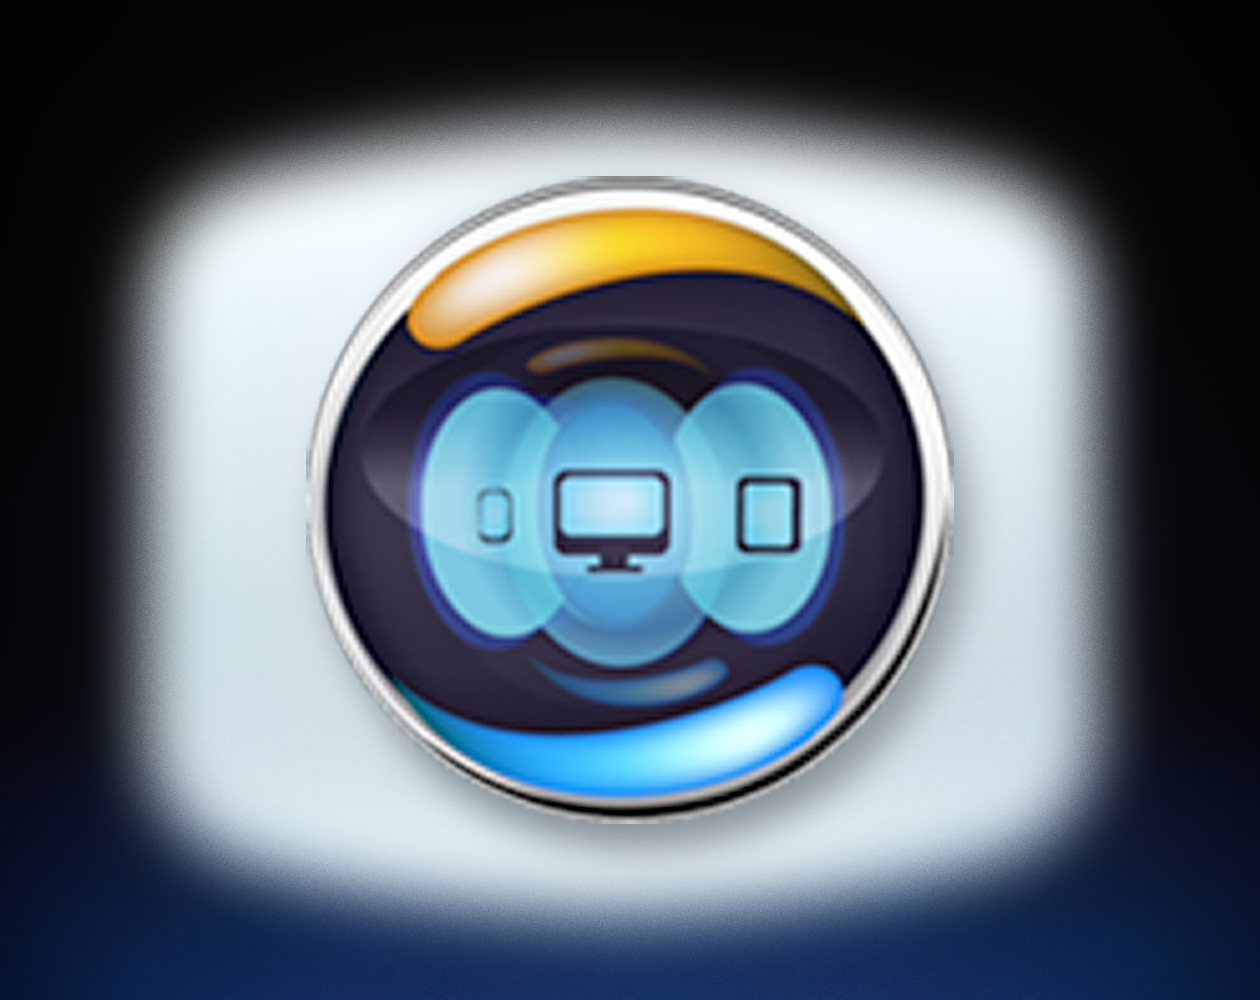 X-Mirage: Транслируем изображение с iOS на Mac